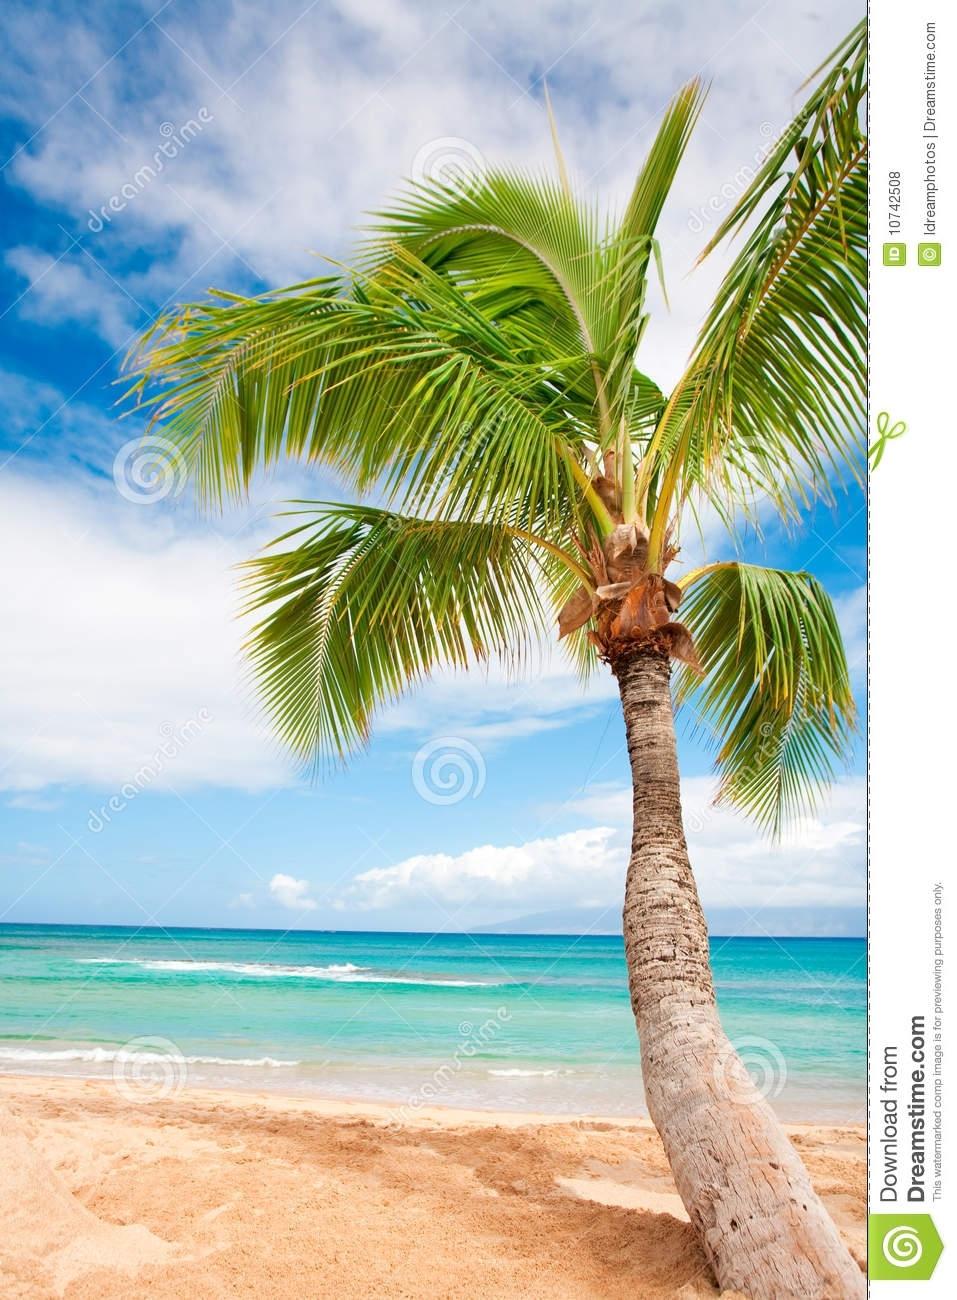 palm tree beach background stock photo. image of beautiful - 10742508